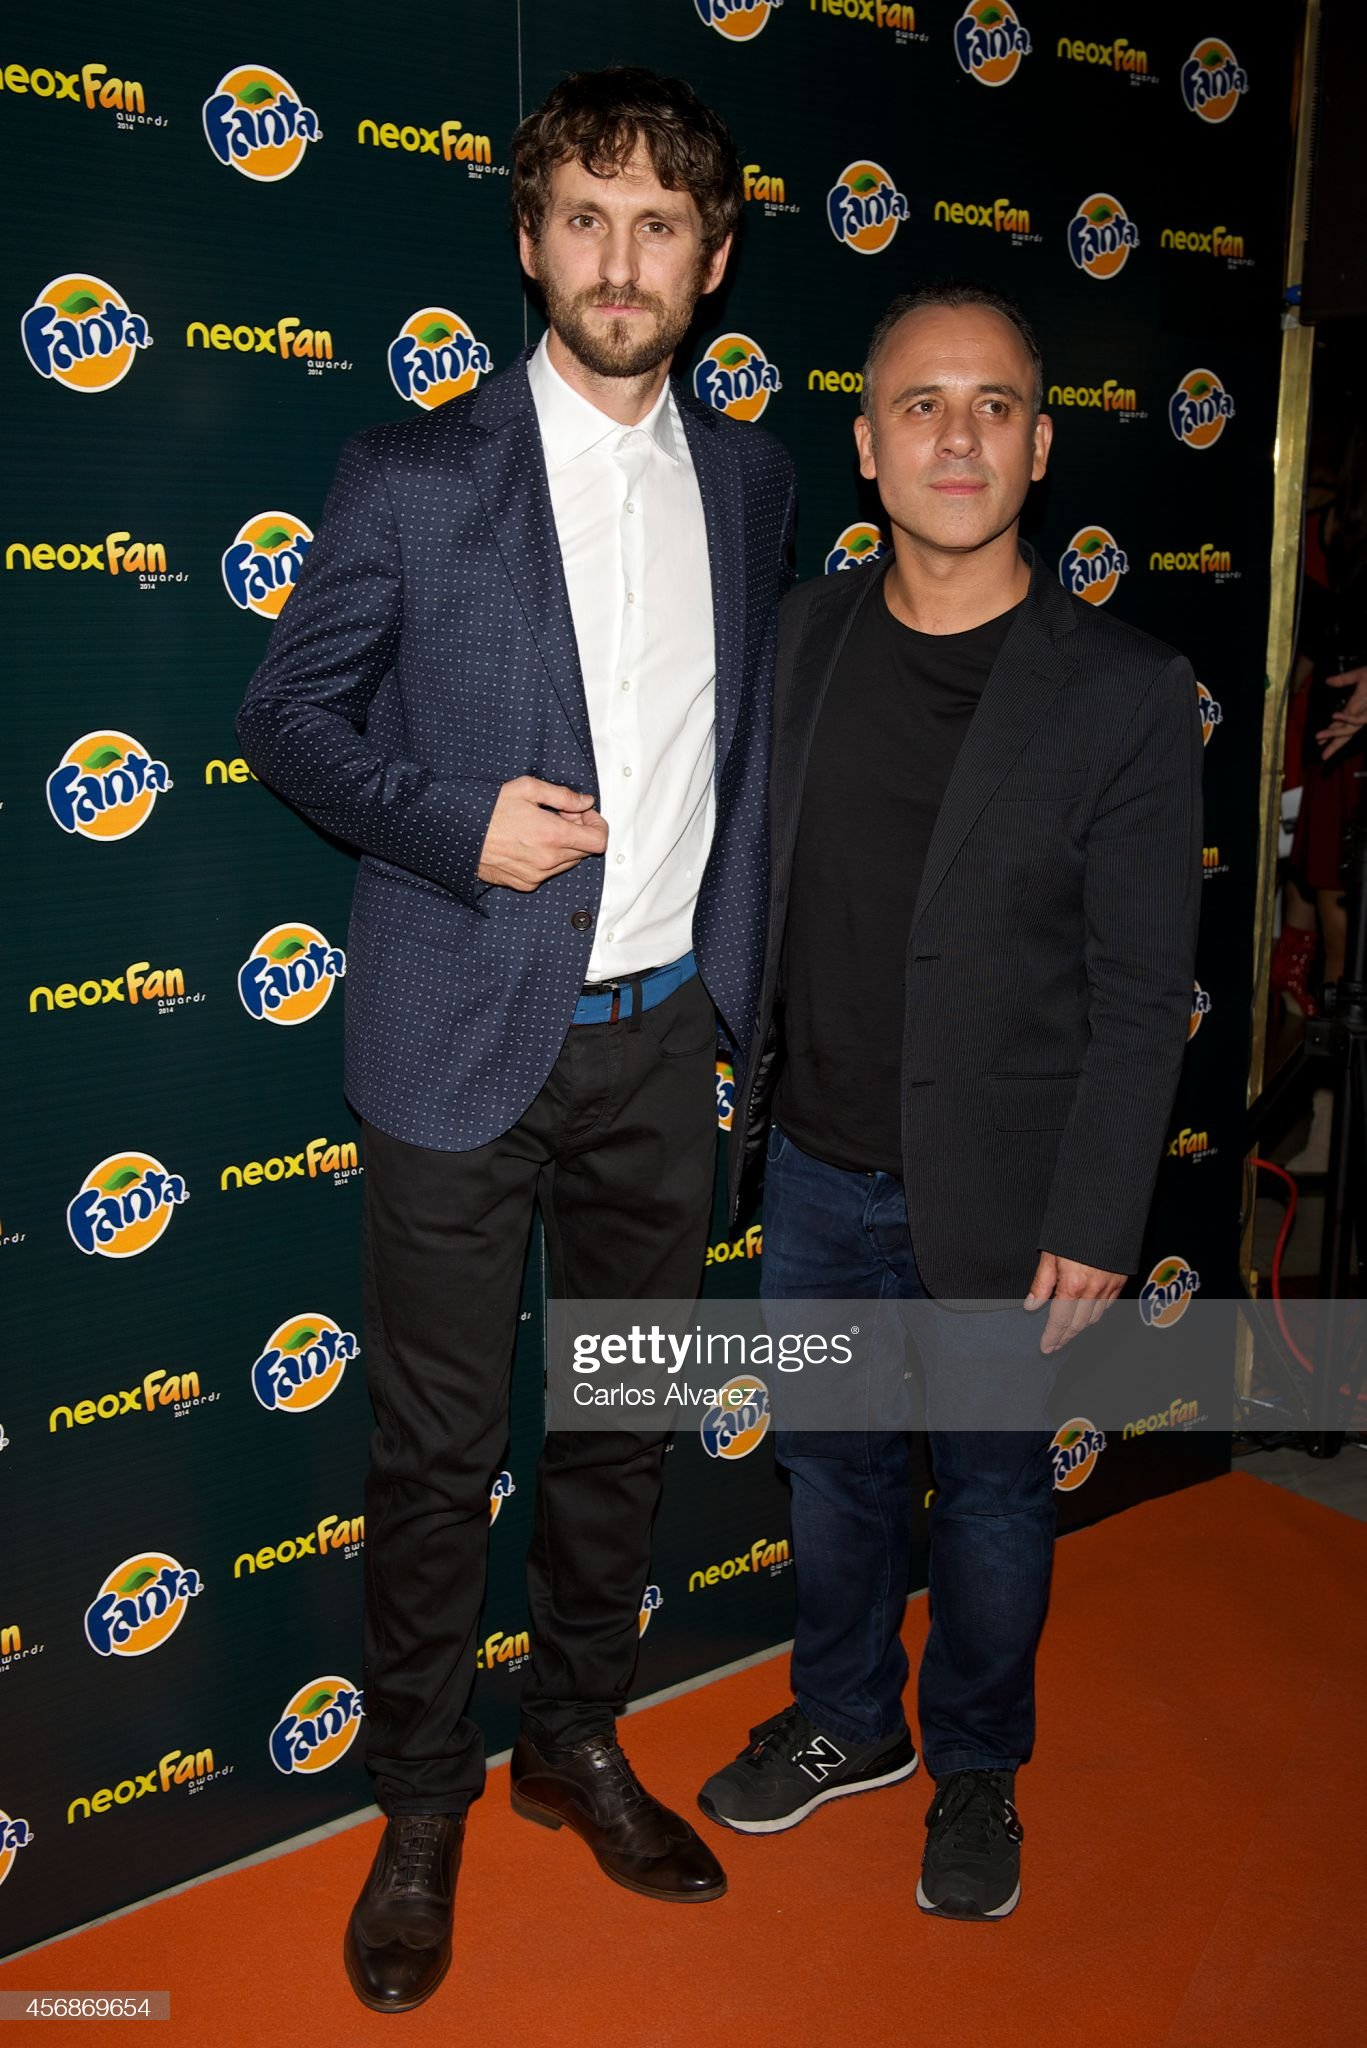 ¿Cuánto mide Raúl Arévalo? - Altura Spanish-actors-raul-arevalo-and-javier-gutierrez-attend-the-neox-fan-picture-id456869654?s=2048x2048